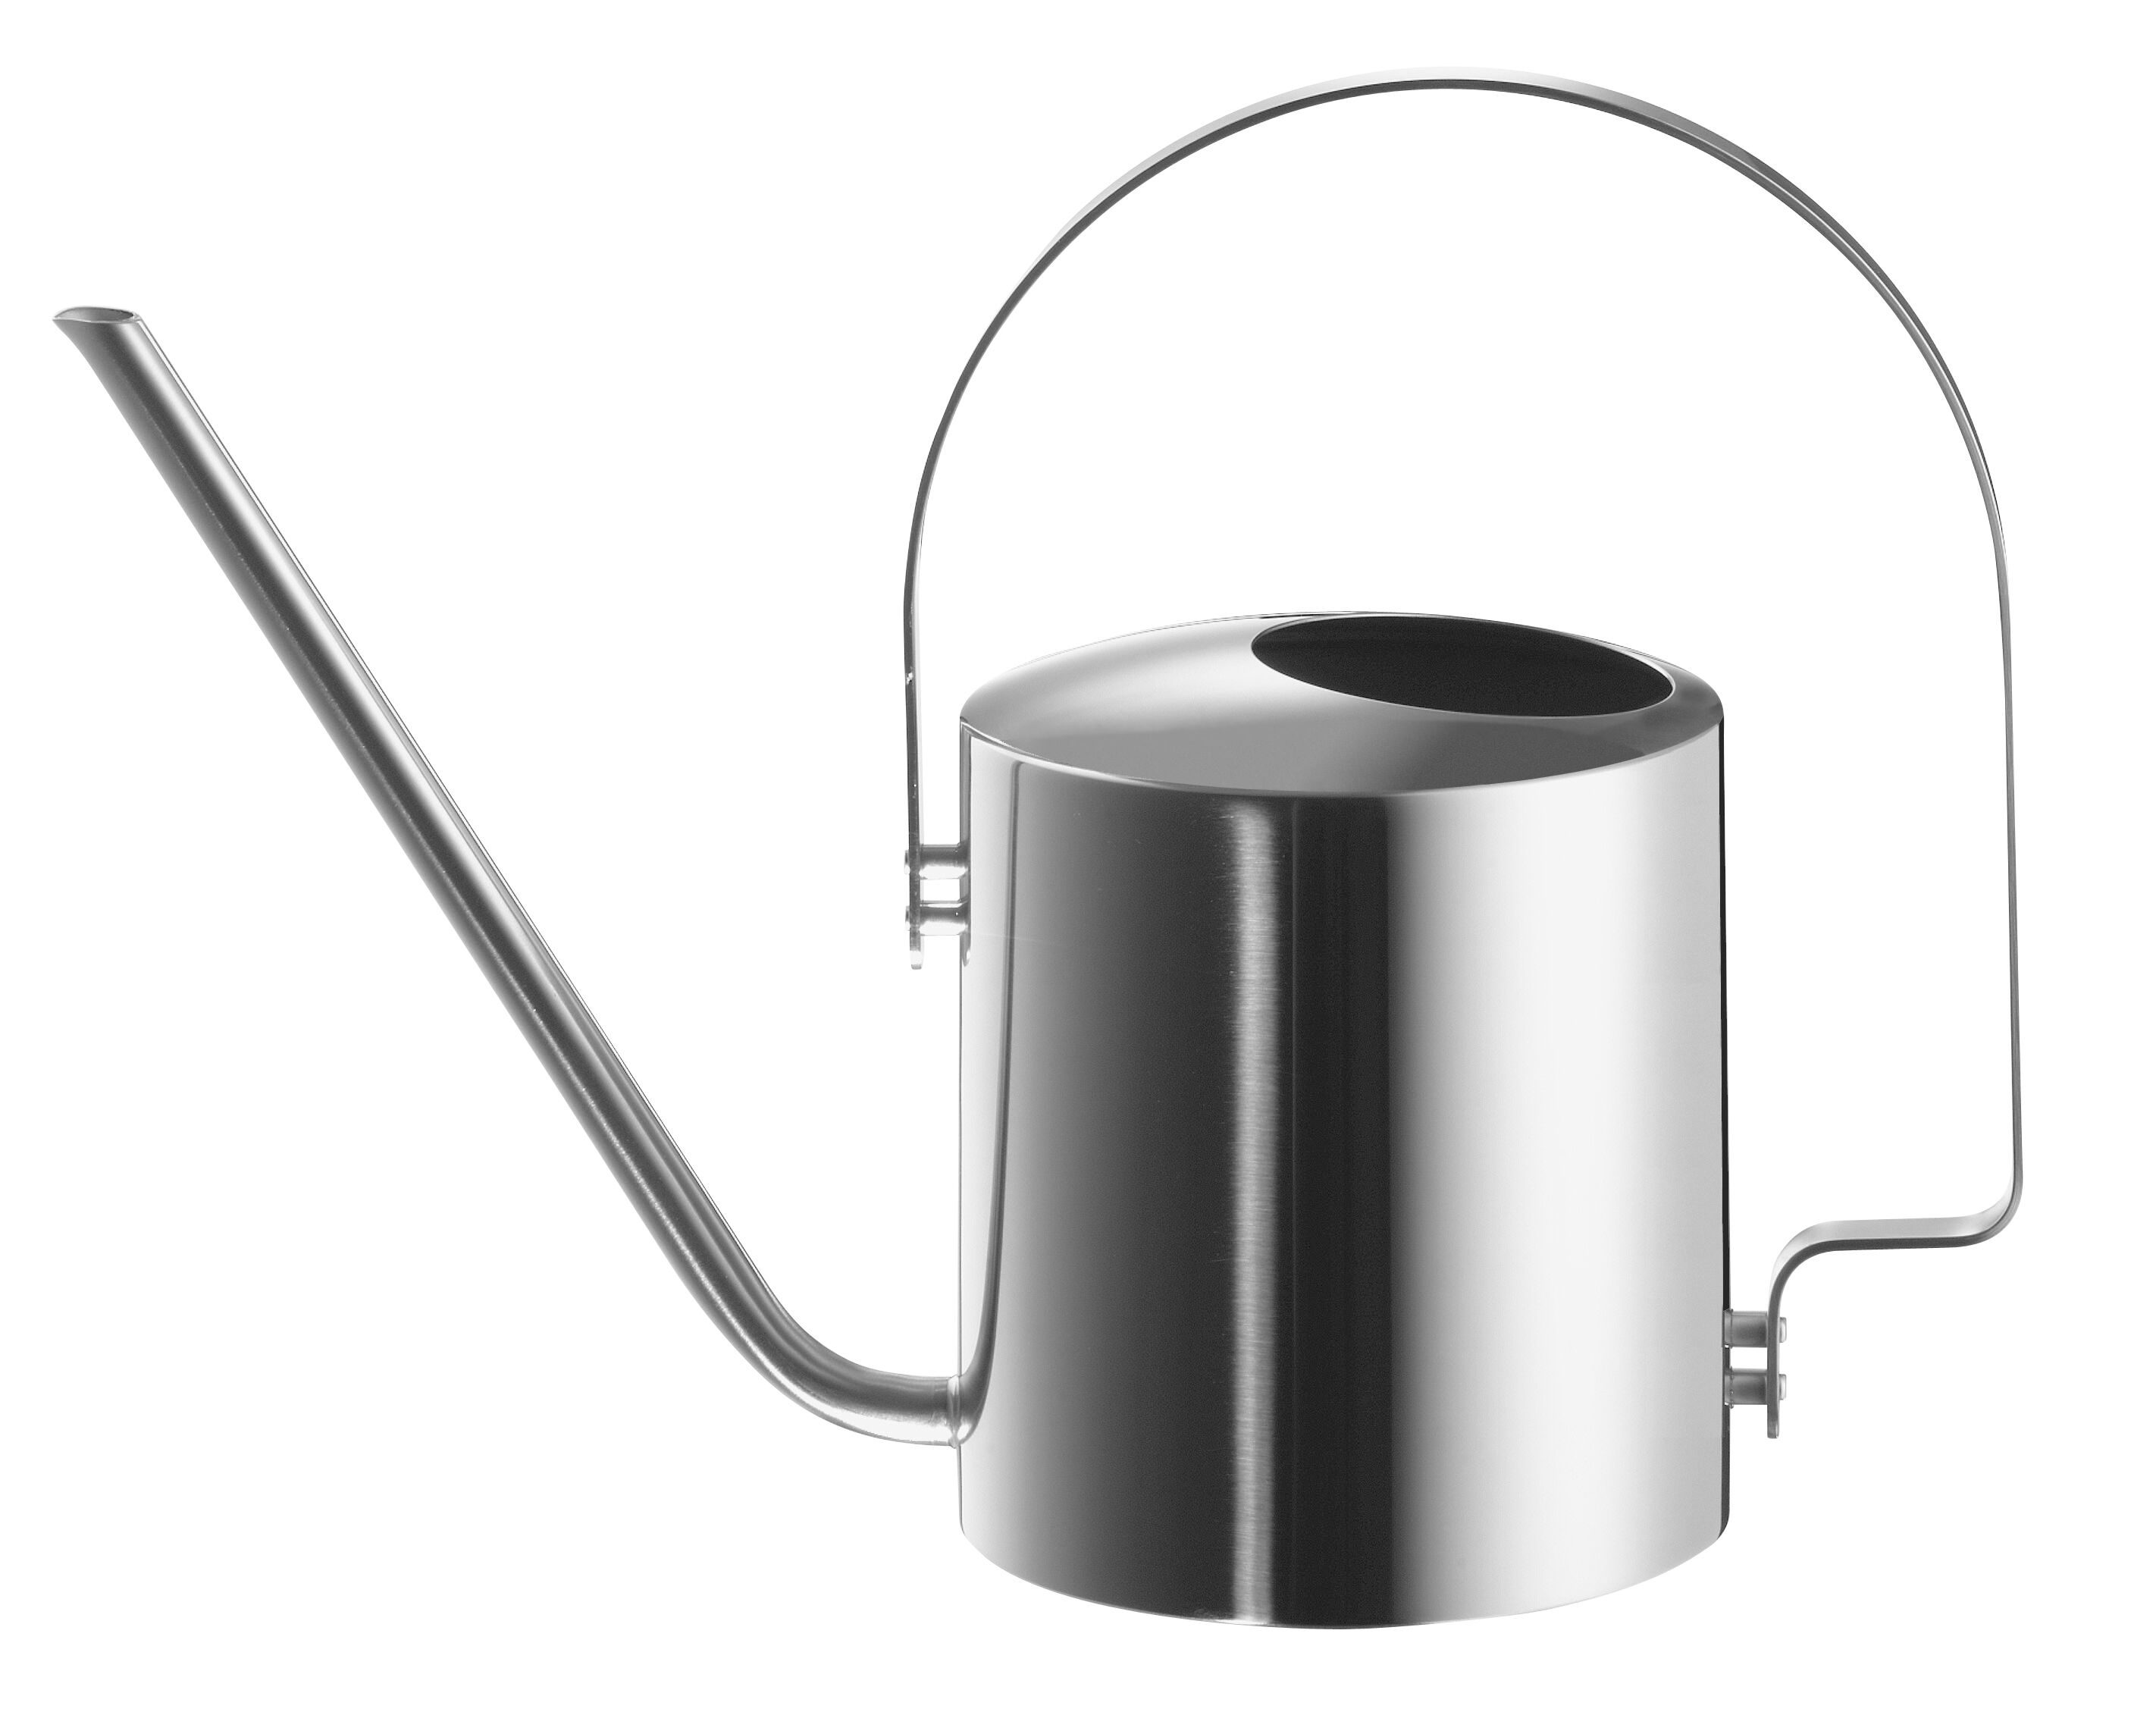 Stelton - Original Flower Watering Can 1,7 L (100-15)